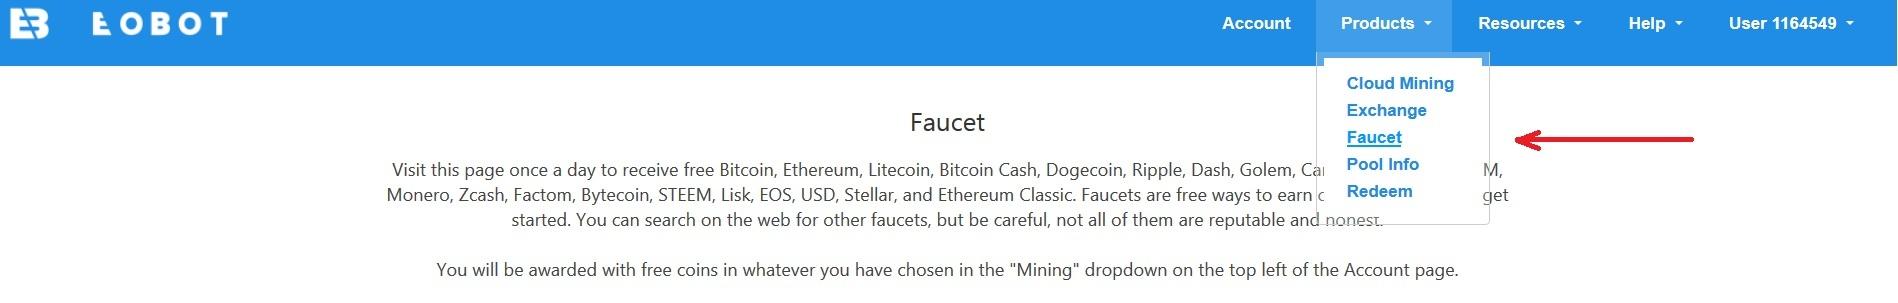 How to start Eobot Bitcoin Cloud Mining - Quora